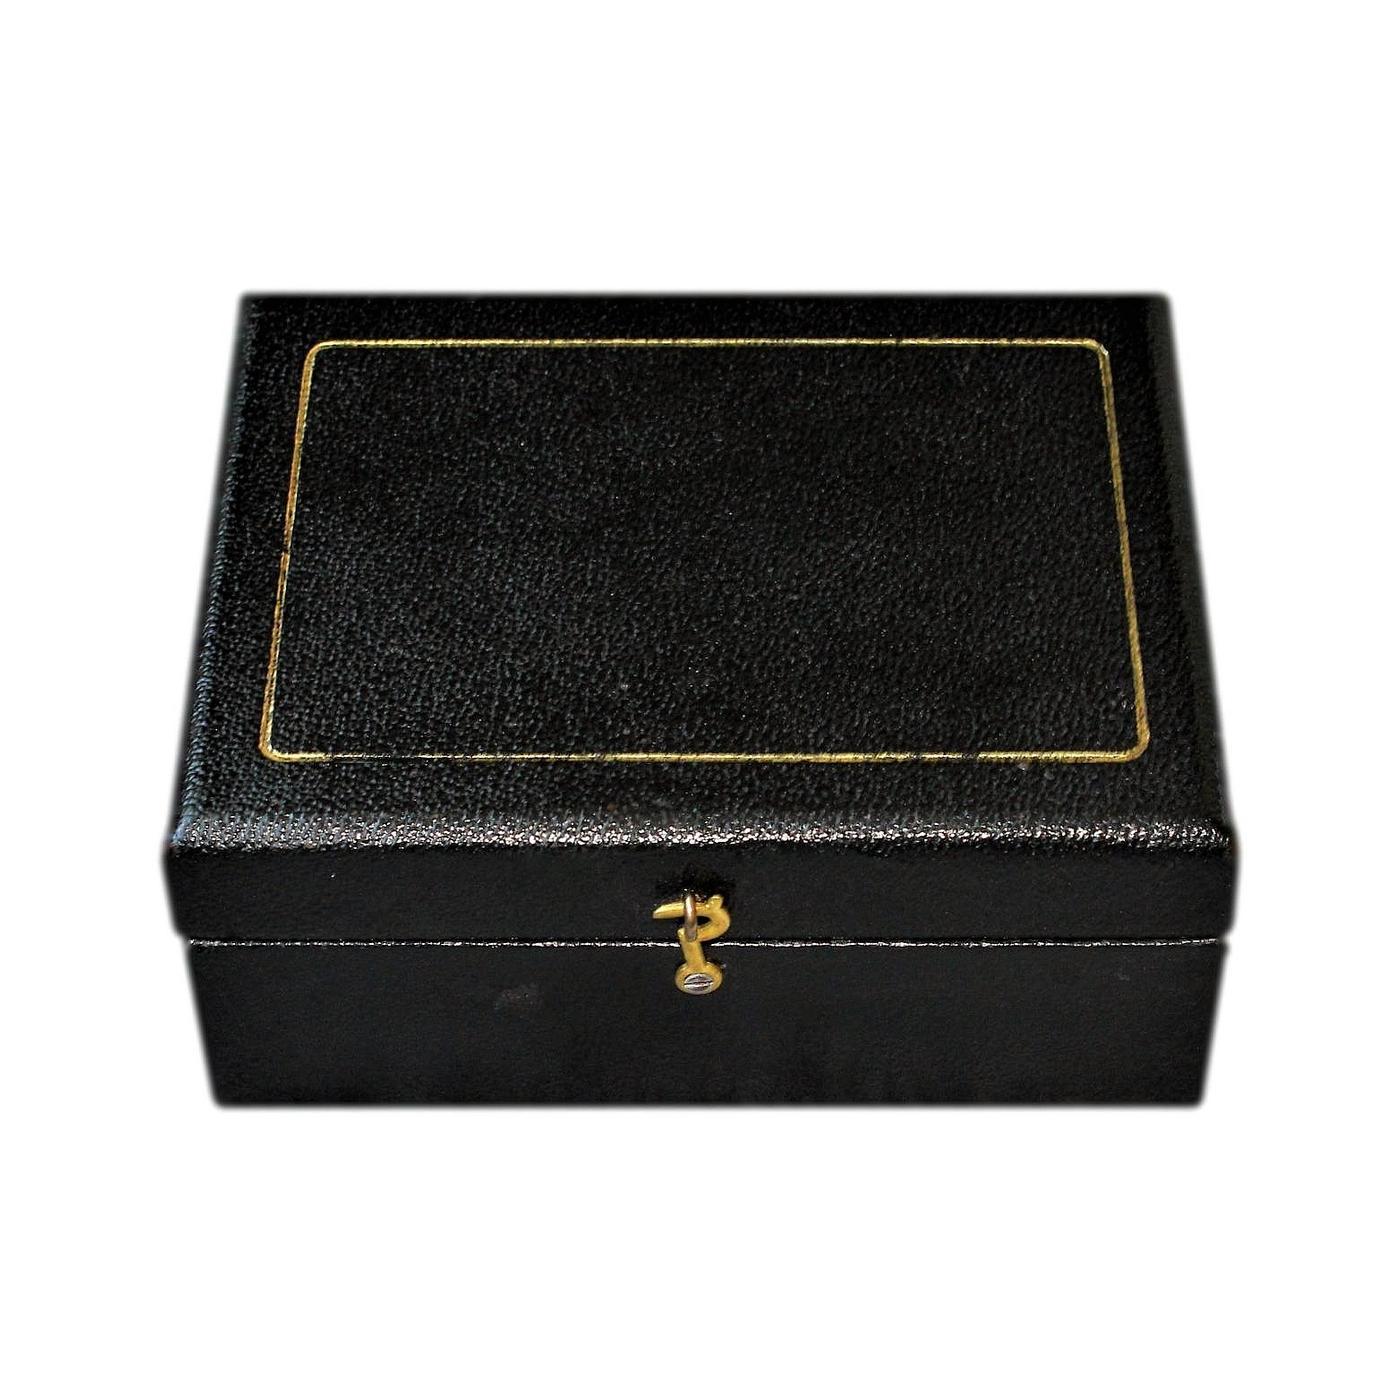 Small Edwardian Velvet Lined Antique Jewellery Box